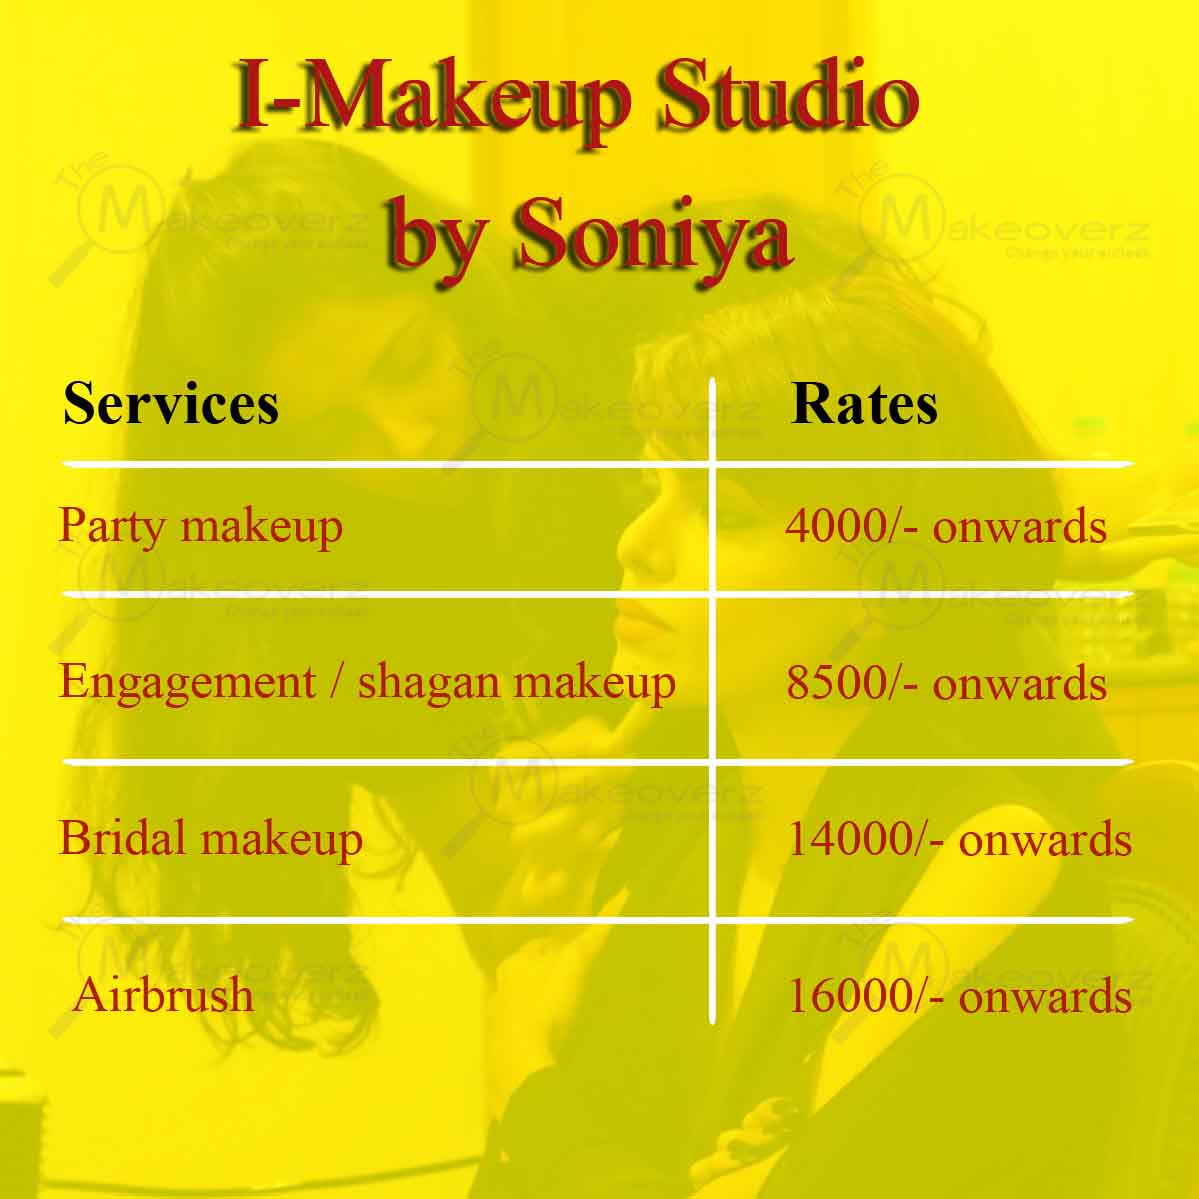 I-Makeup Studio by Soniya - Sector 4, Dwarka